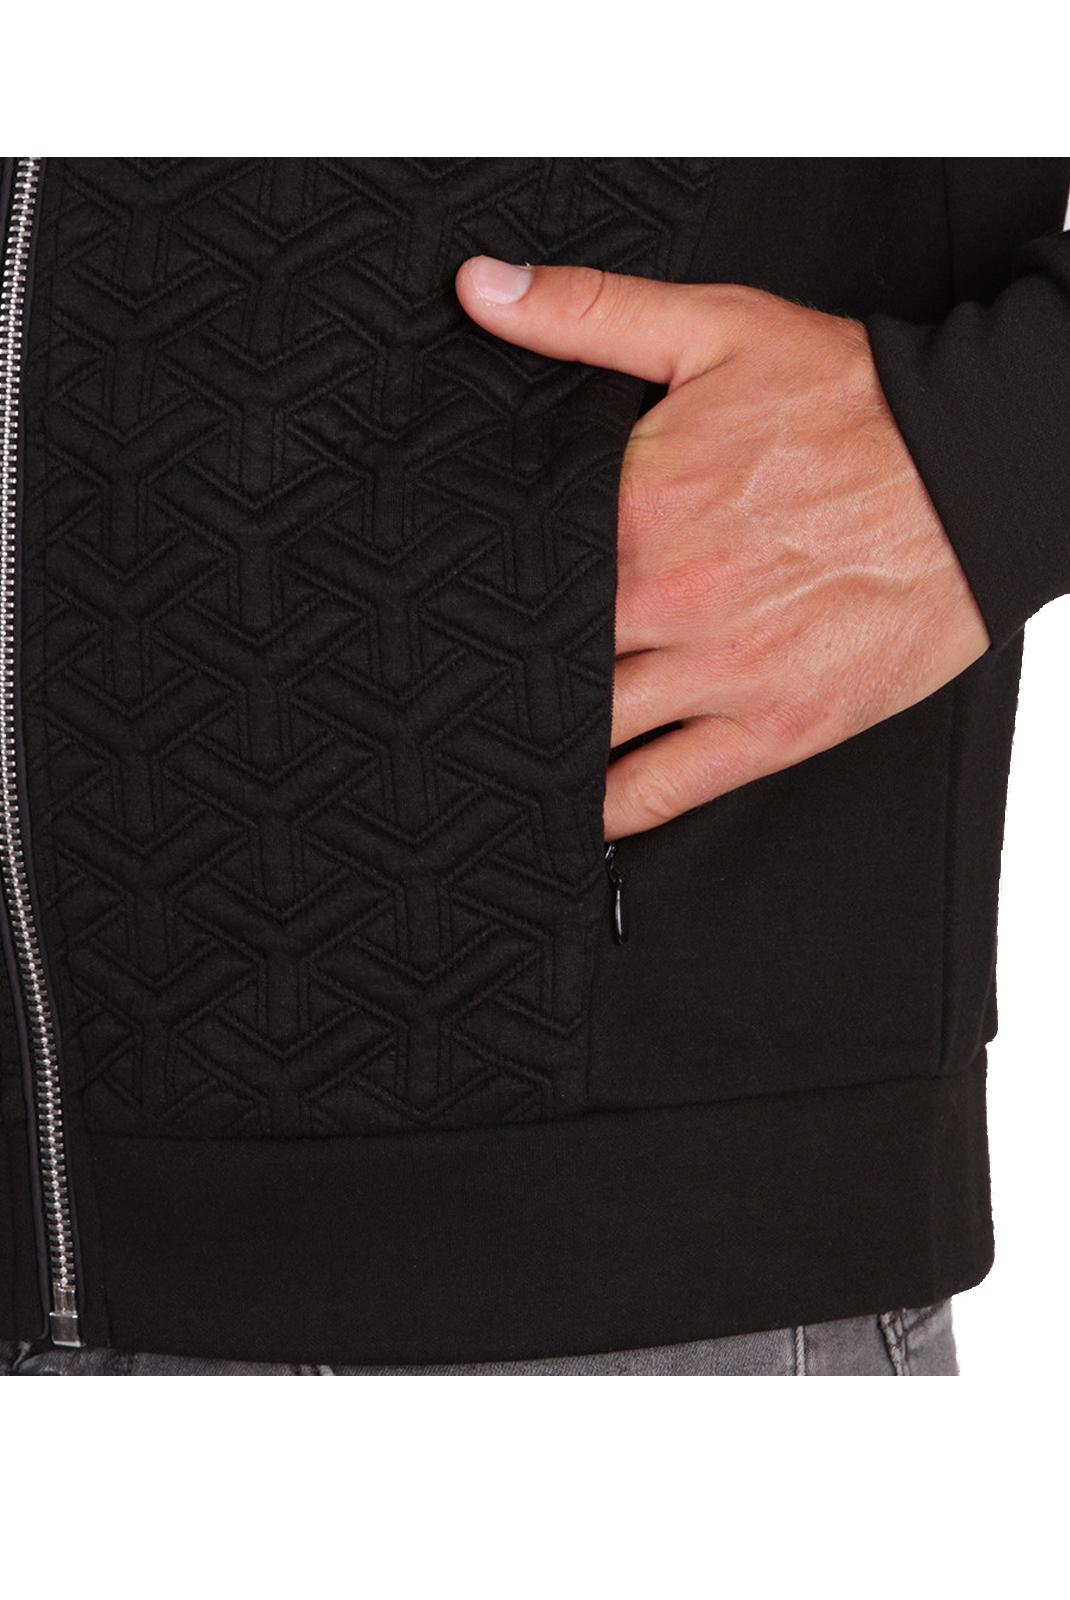 Vestes zippées  Kaporal MAVY BLACK